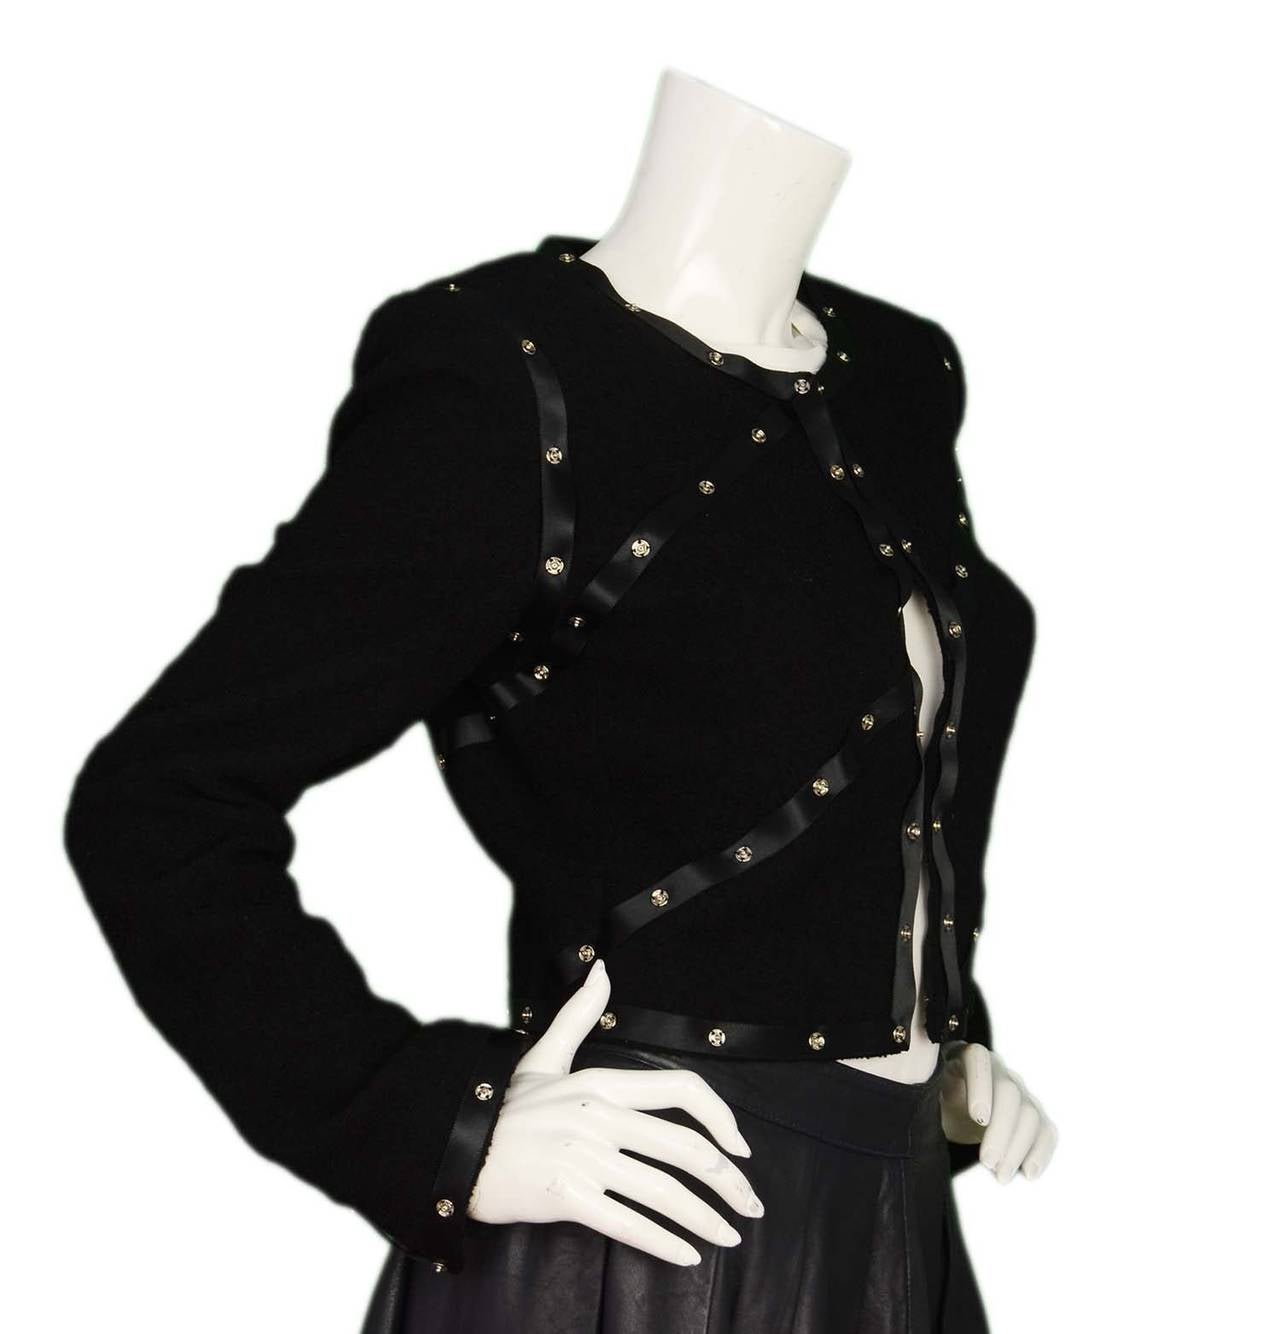 CHANEL 2003 Black Boucle Cropped Jacket w/Snap Detailing sz 40 2